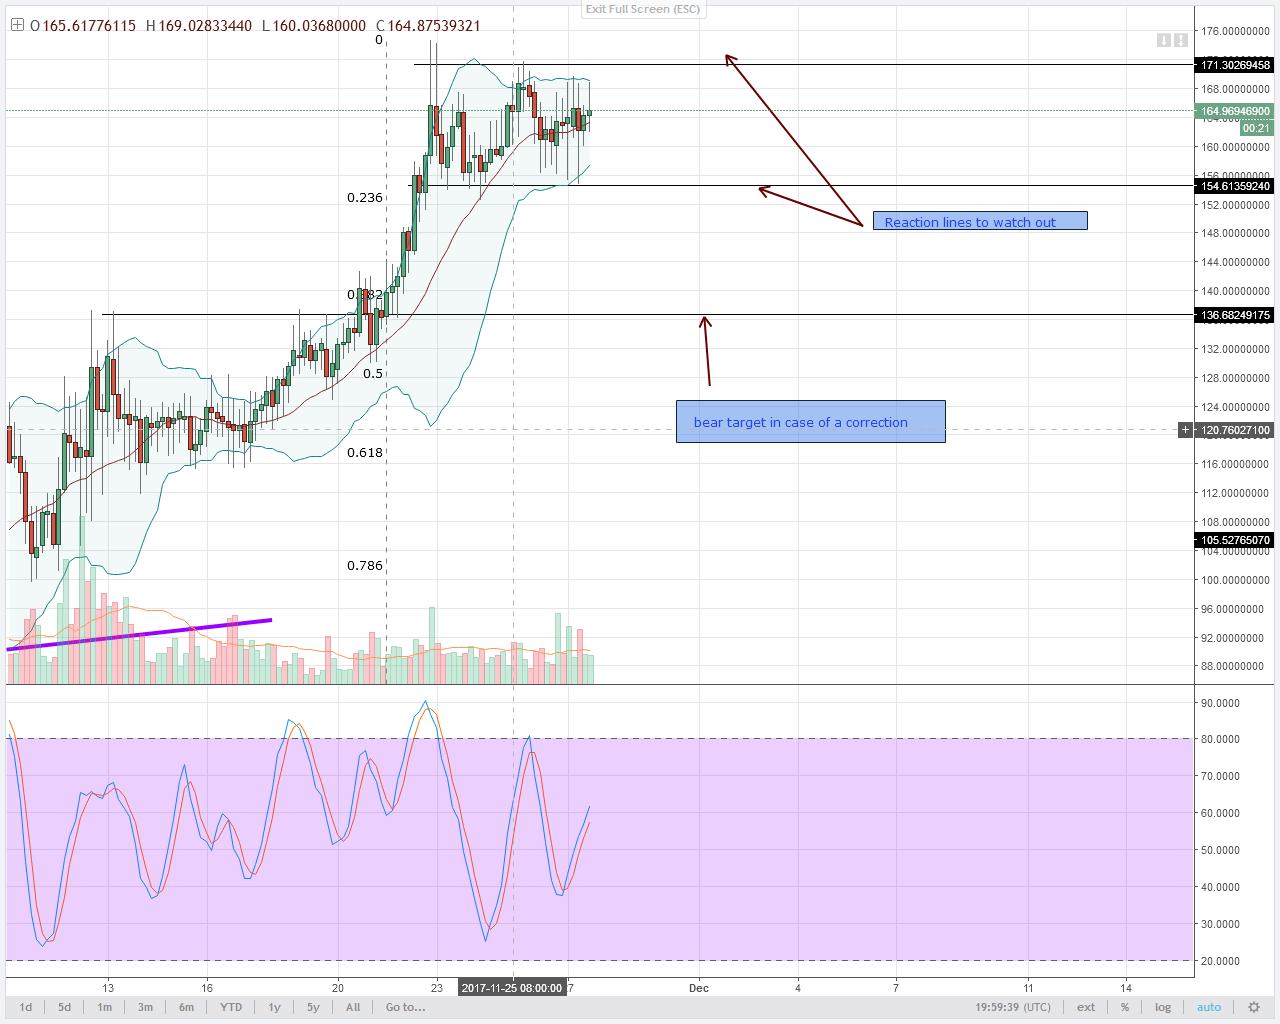 alt coin Monero 4HR chart technical analysis